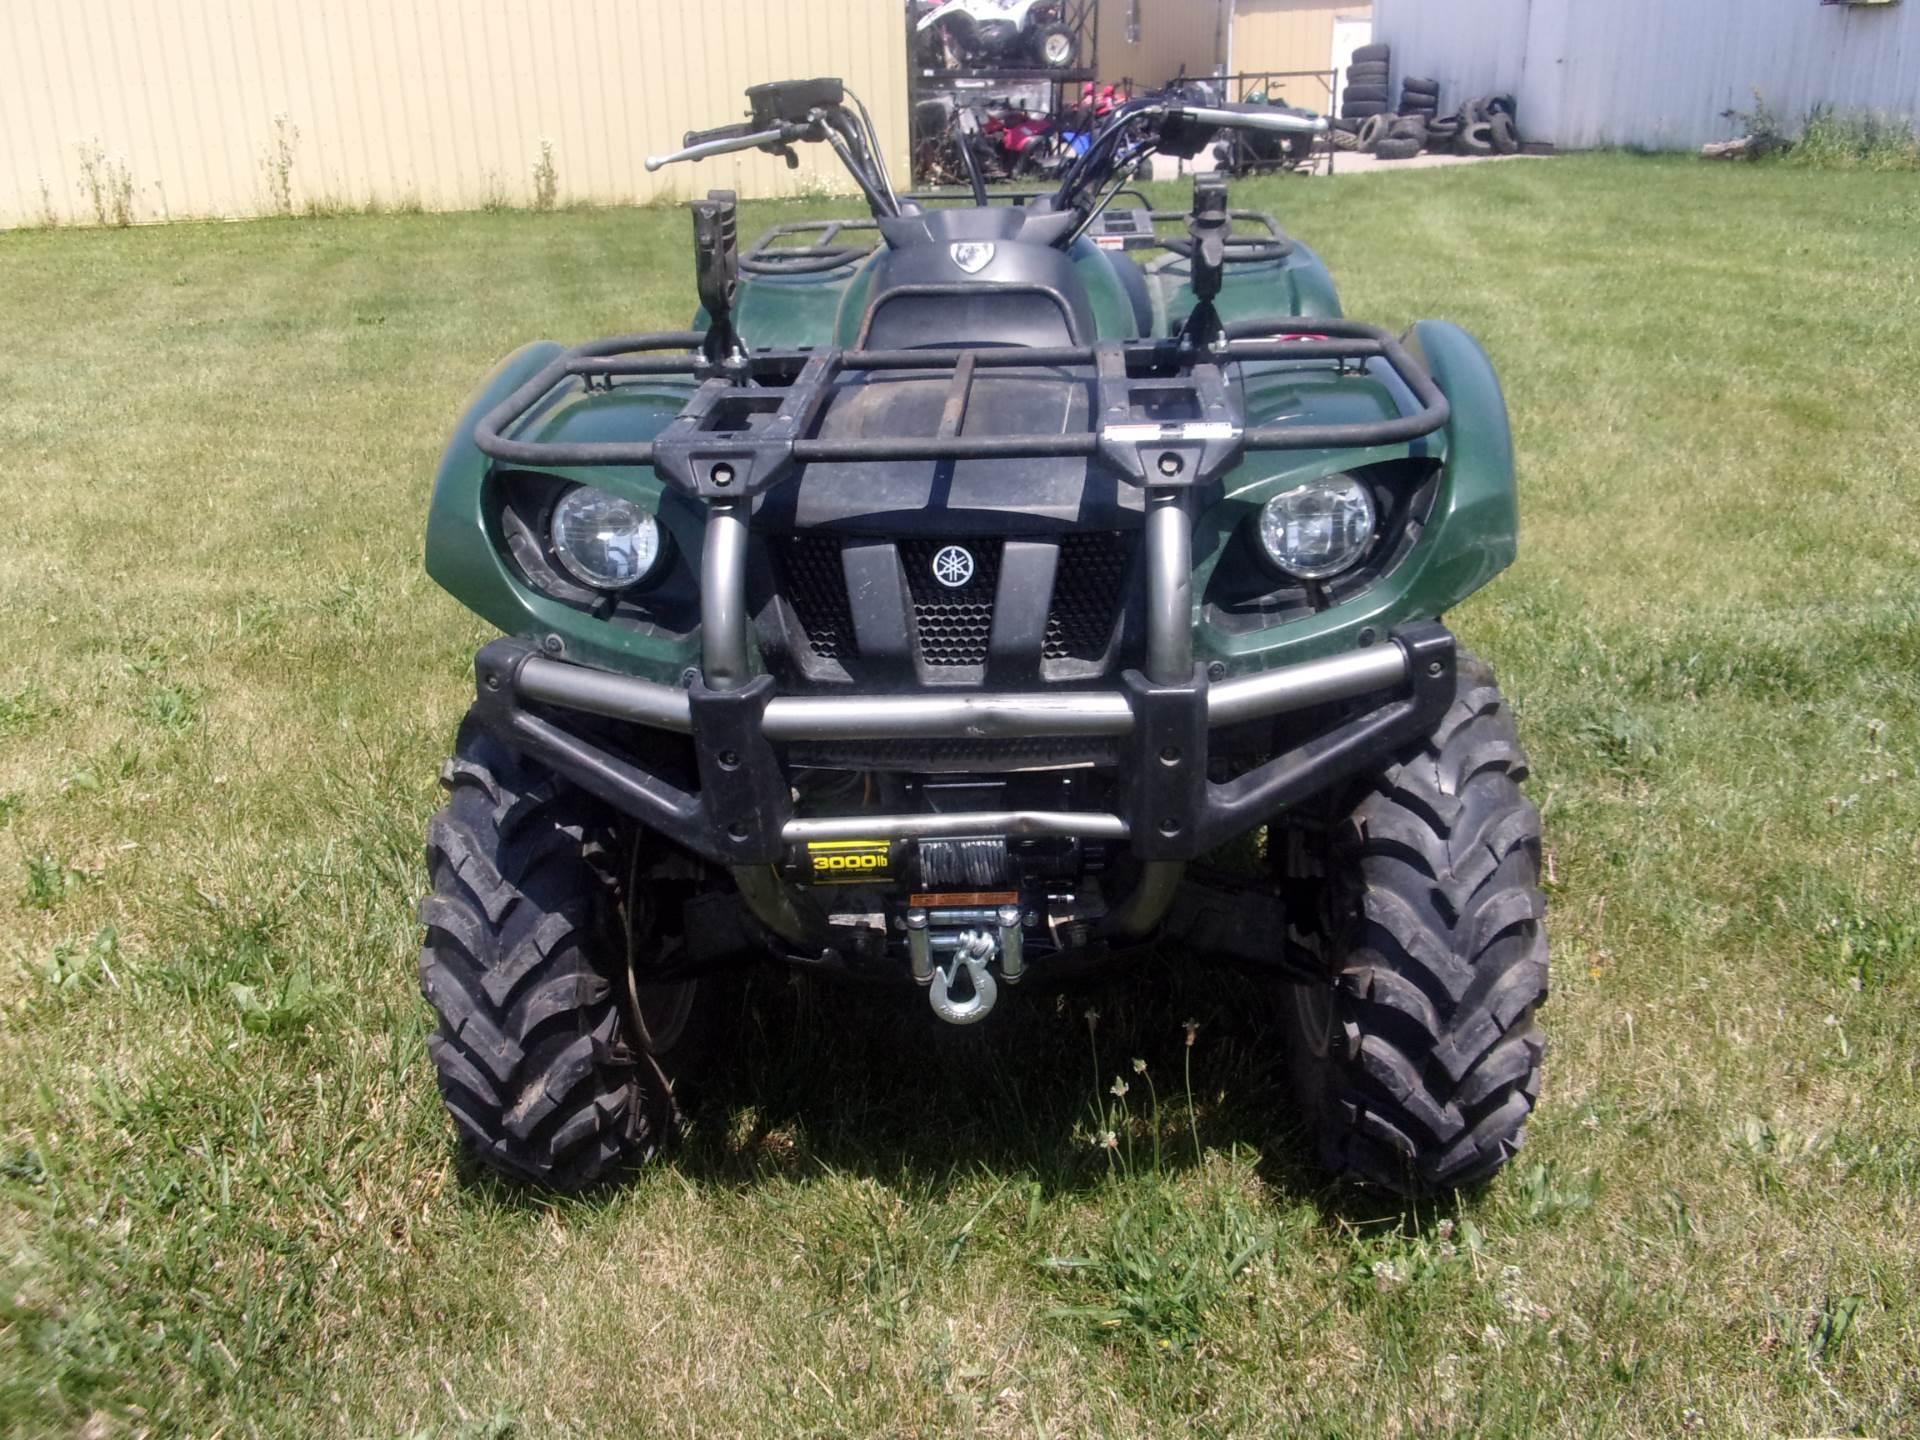 2002 Yamaha Grizzly 660 2